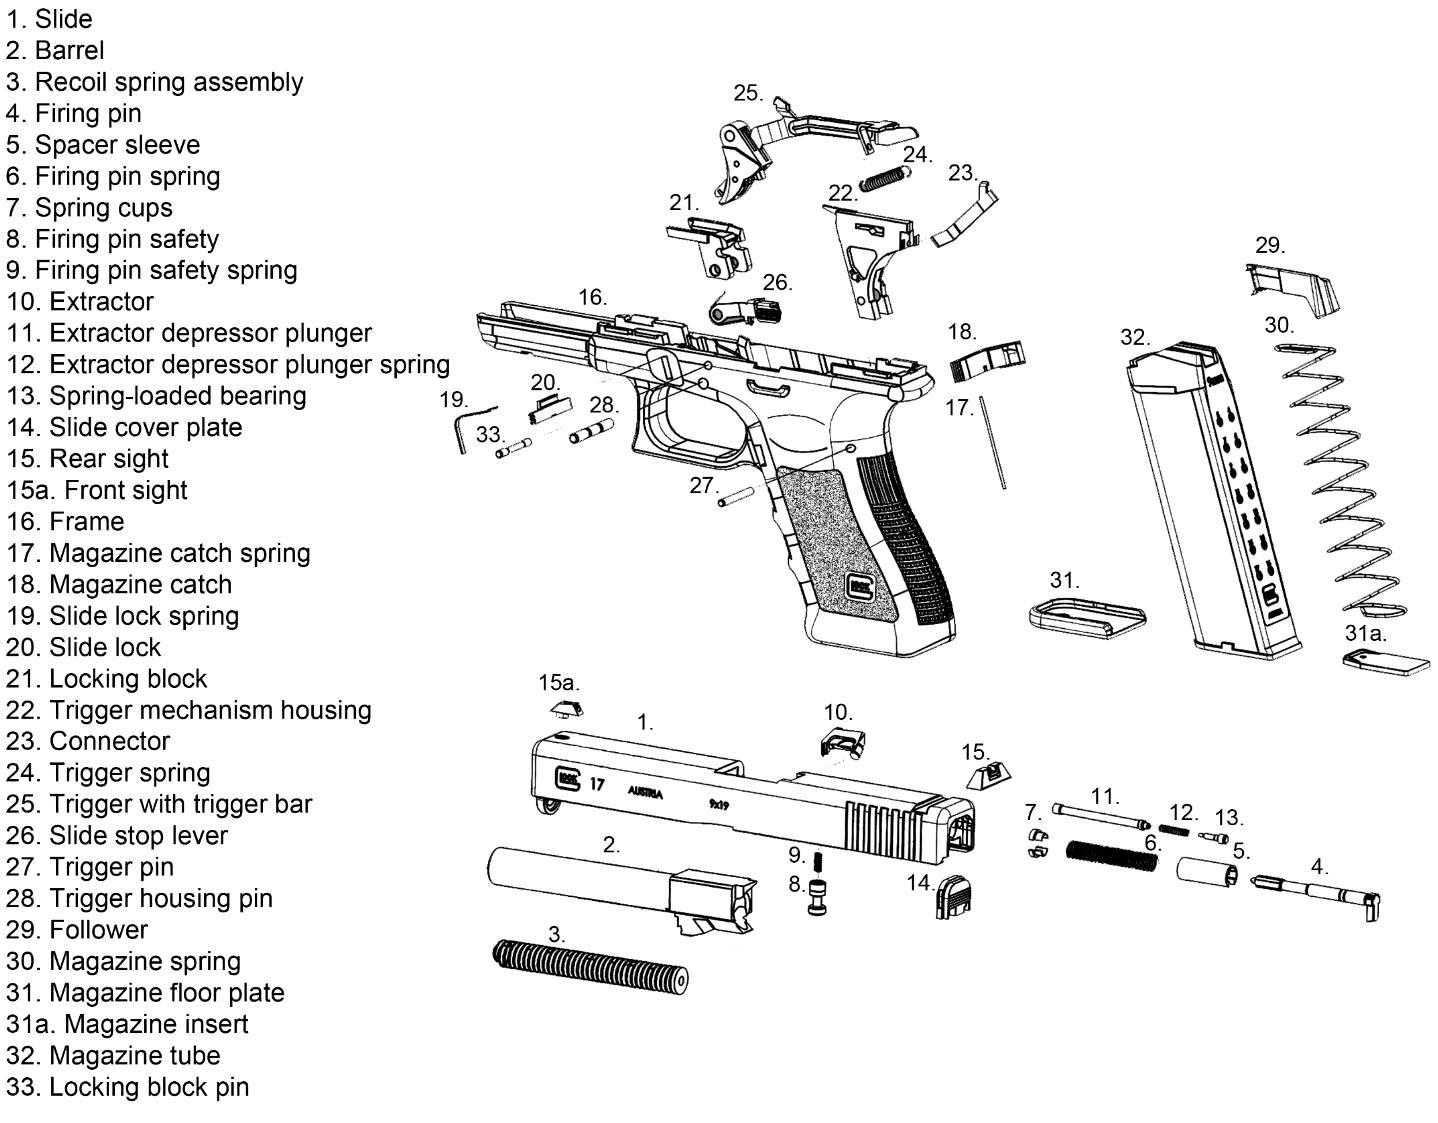 glock 17 exploded diagram firearms glock 22 guns firearms glock 17 frame parts diagram glock 17 nomenclature diagram [ 1438 x 1123 Pixel ]